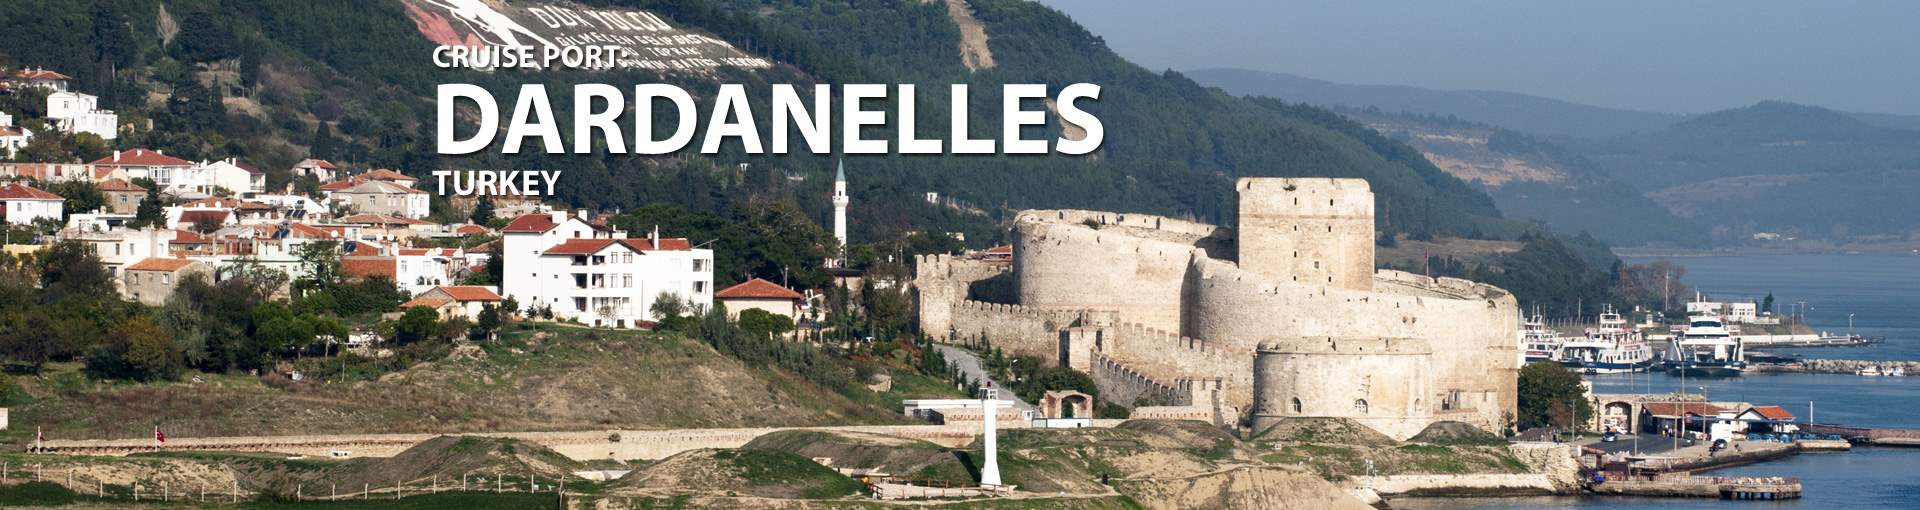 Cruises to Dardanelles, Turkey